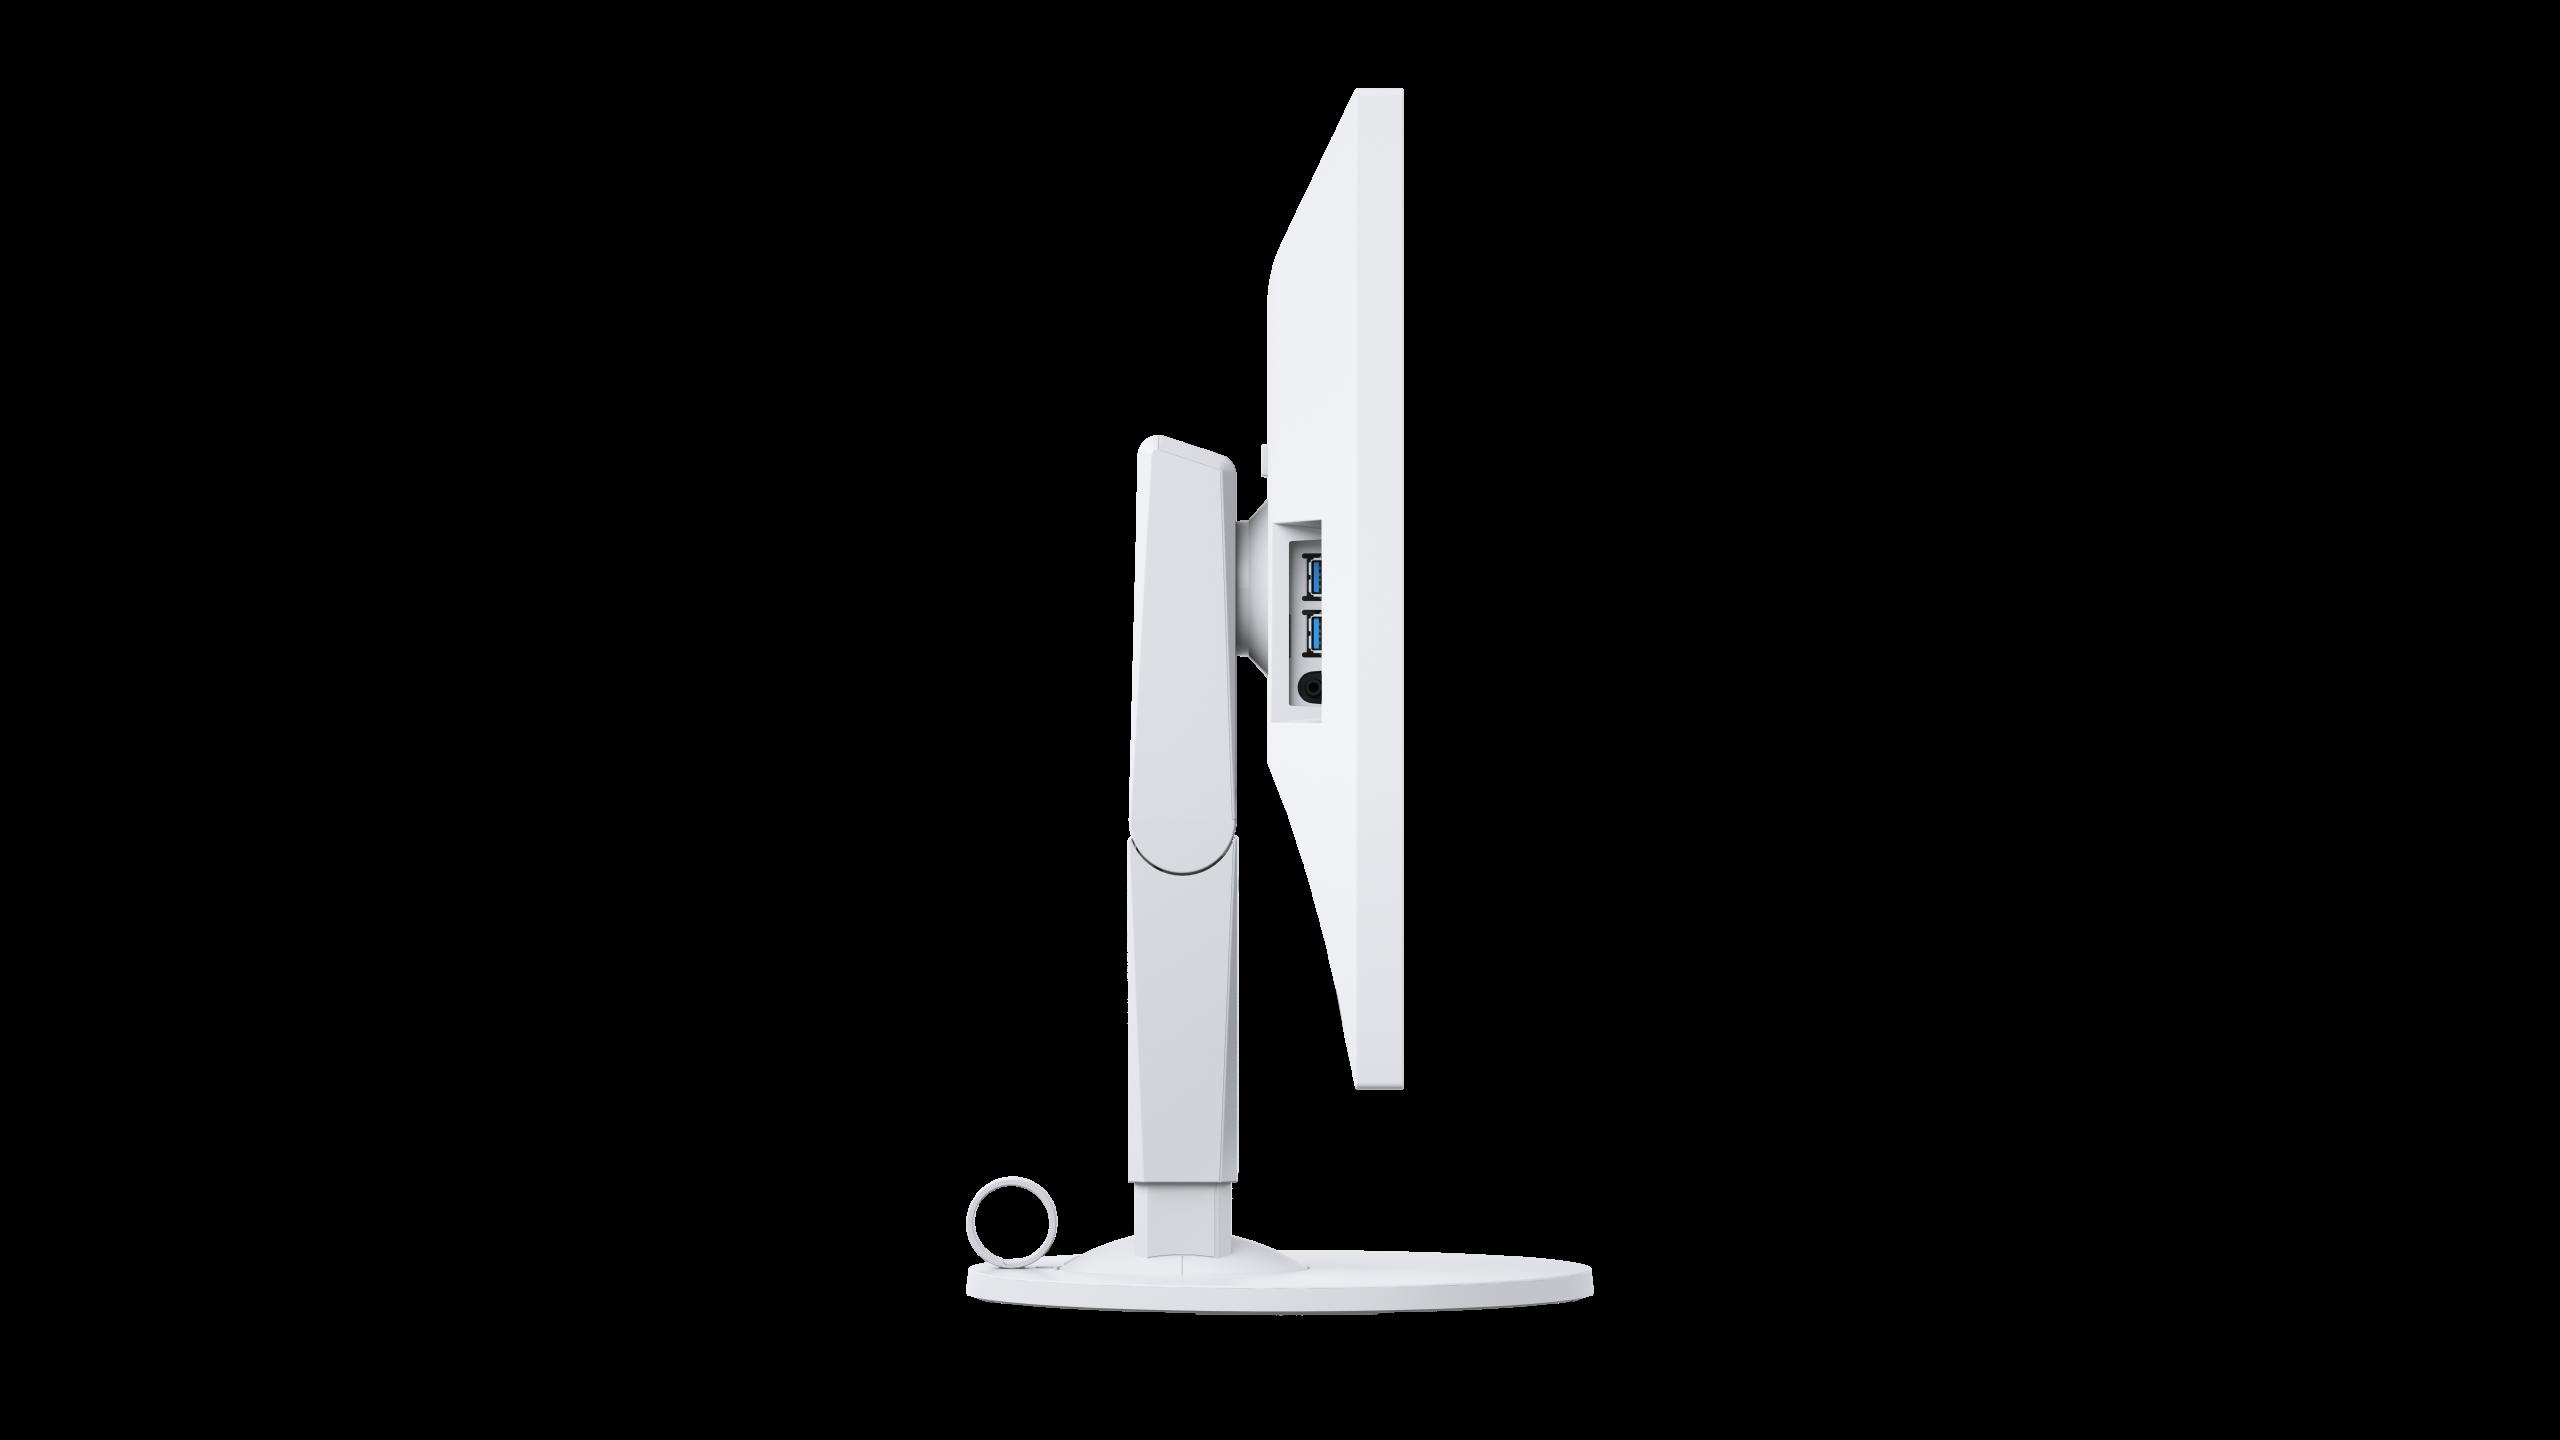 Eizo Flexscan EV2780: Teures USB-C-Display mit guter Ausstattung kommt im Januar - Flexscan EV2780 (Bild: Eizo)